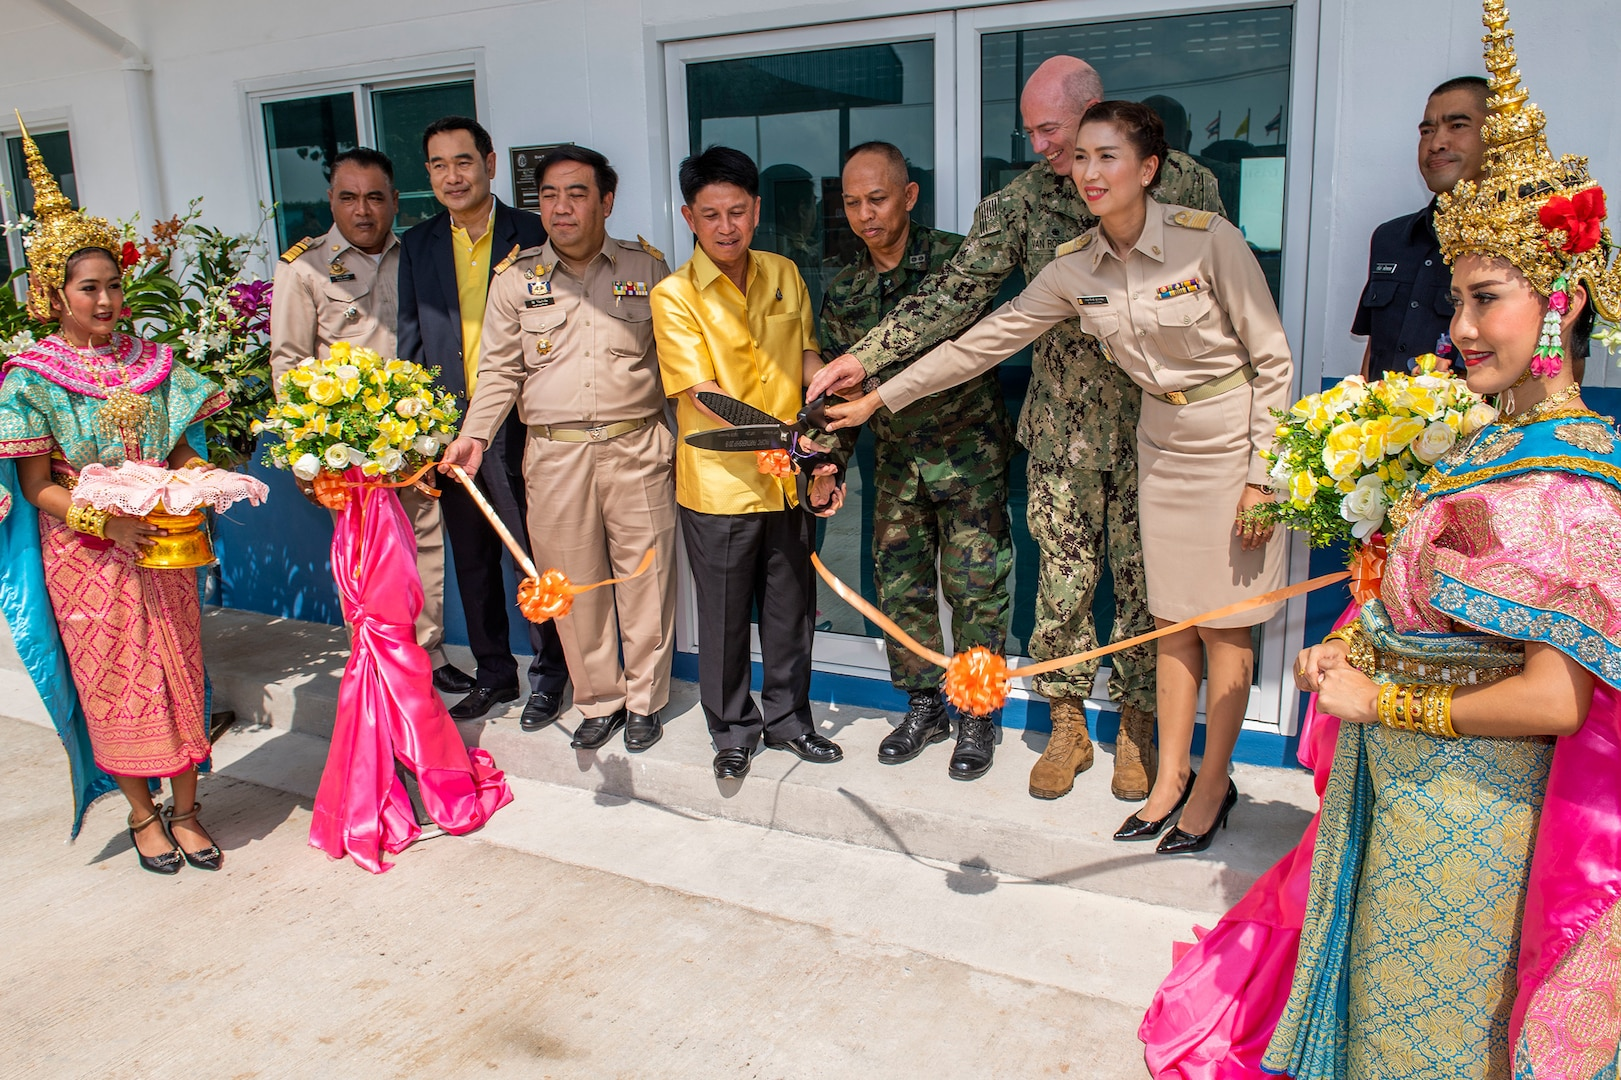 Pacific Partnership 2019 Conducts Ribbon Cutting Ceremony at Ban Surasak School